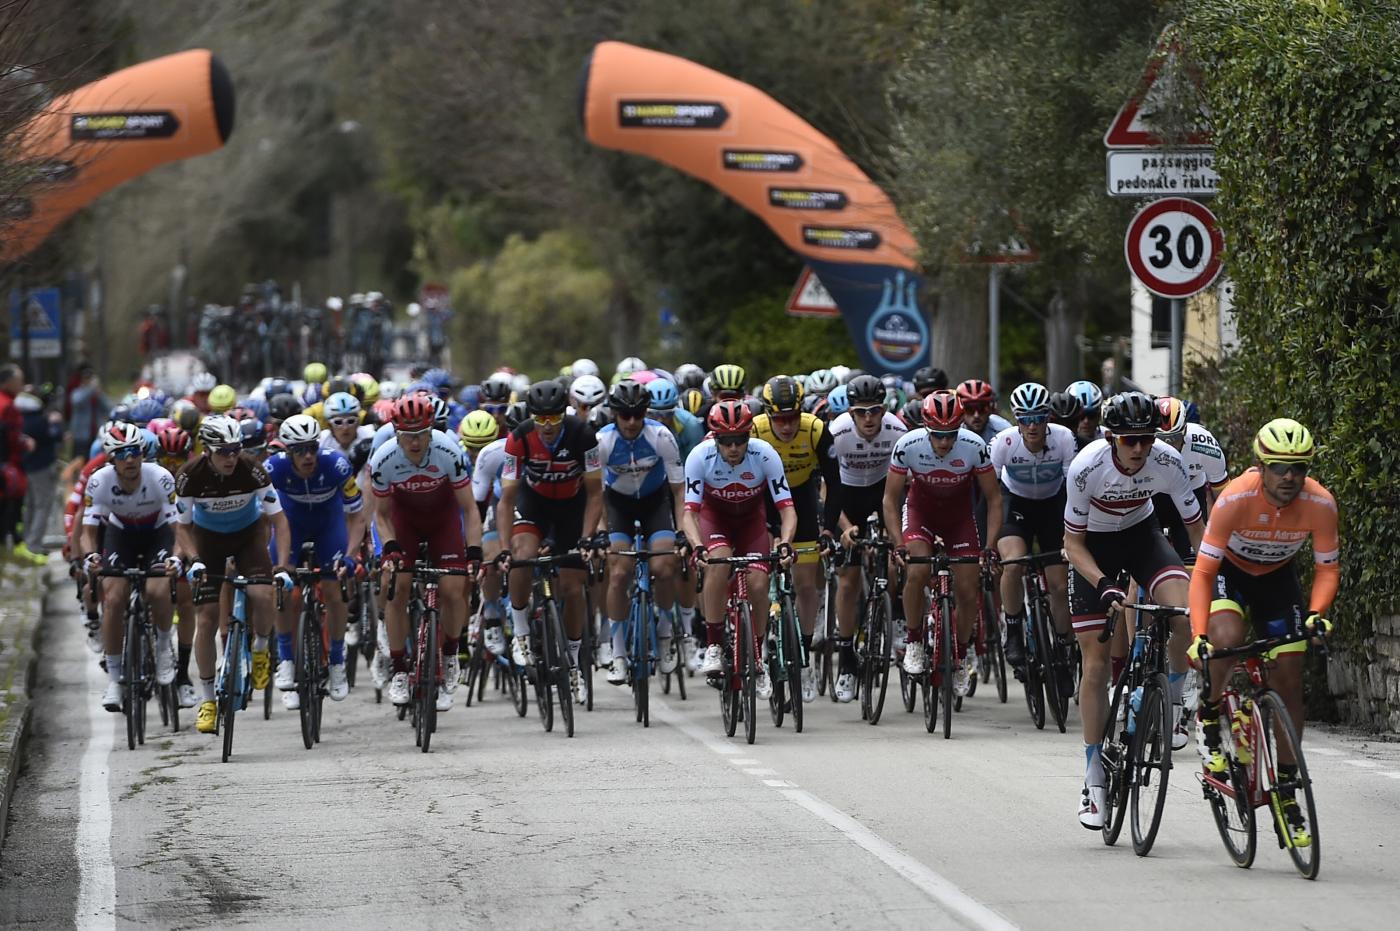 Tirreno-Adriatico: Kittel sprint su un fenomenale Sagan. Gaviria, mano rotta